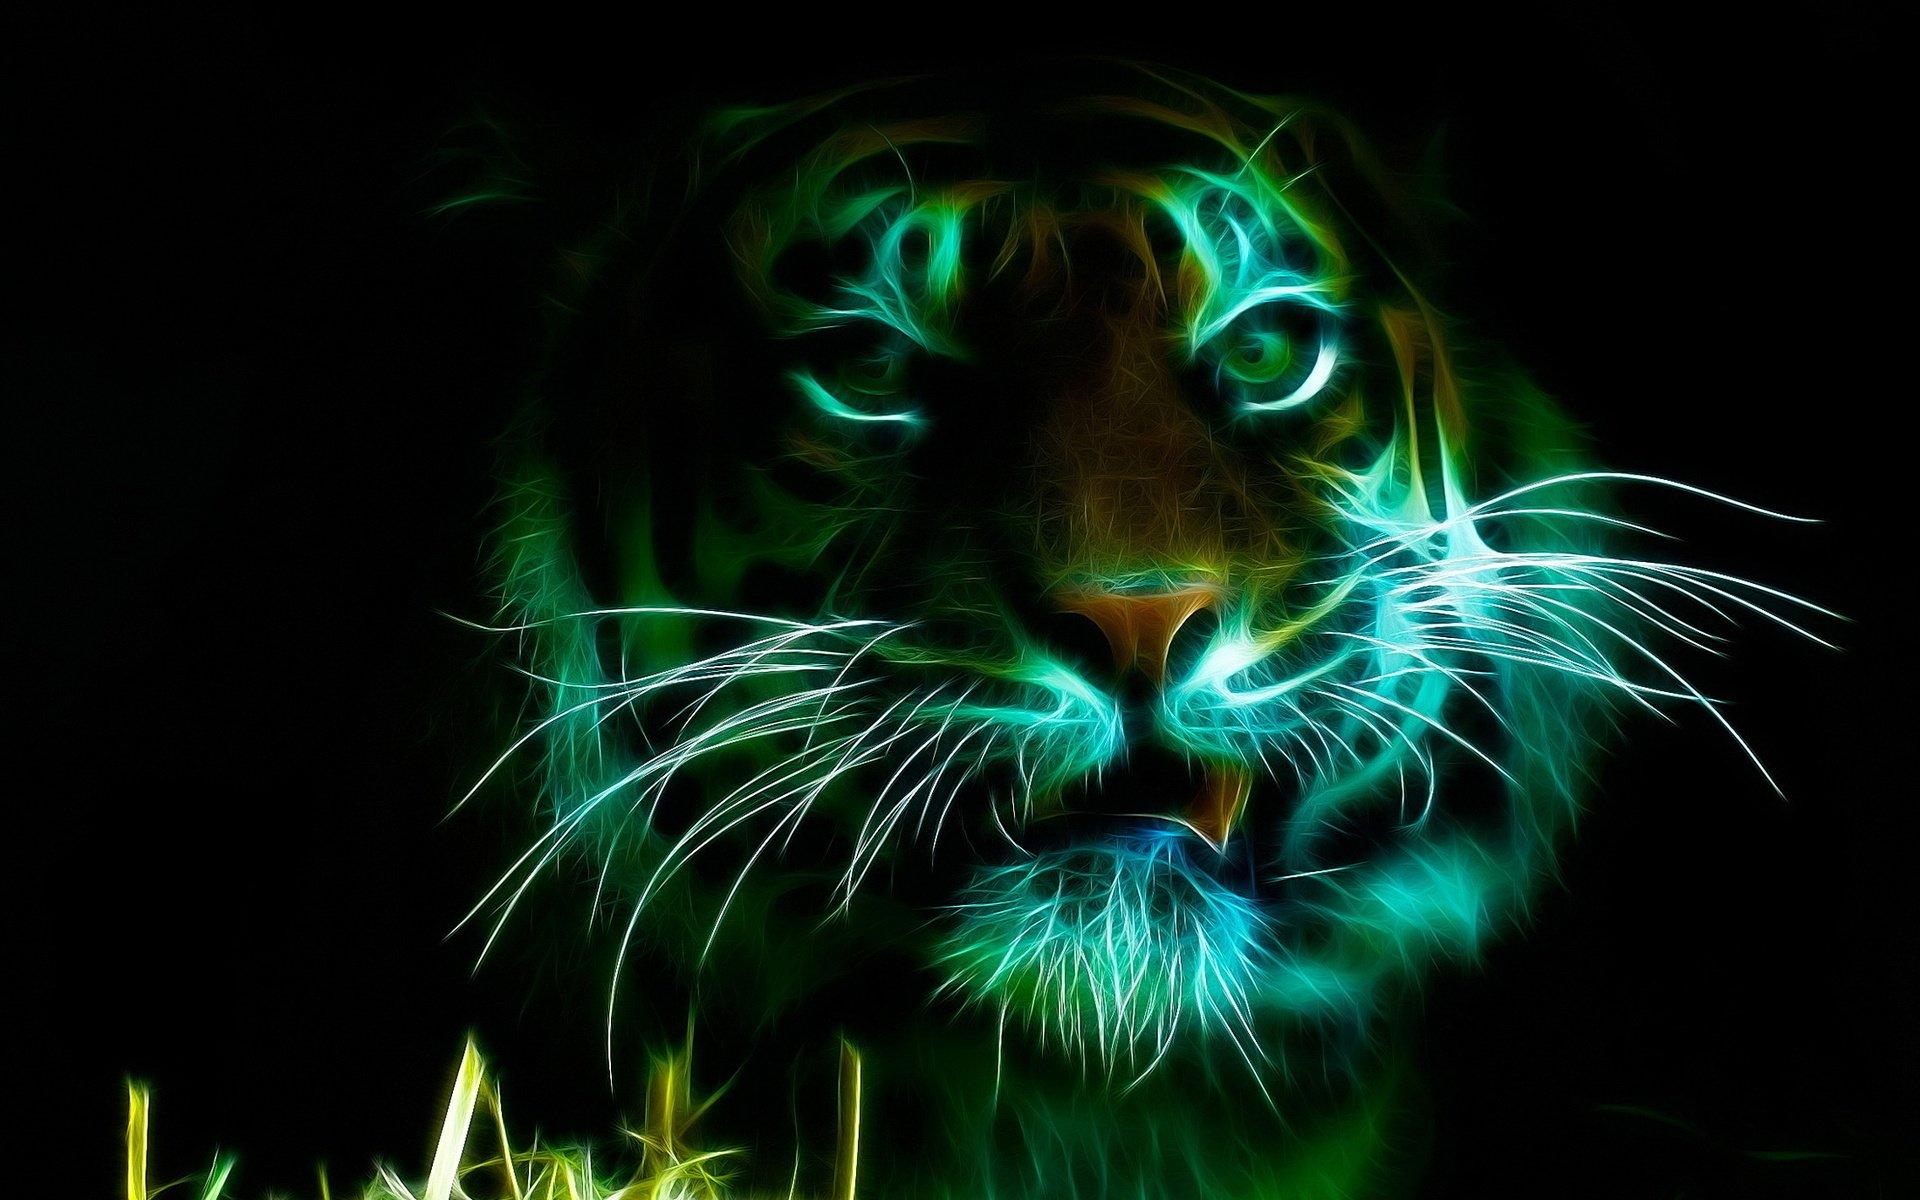 Neon Animal Print Wallpaper Tigre Fond D 233 Cran Hd Arri 232 Re Plan 1920x1200 Id